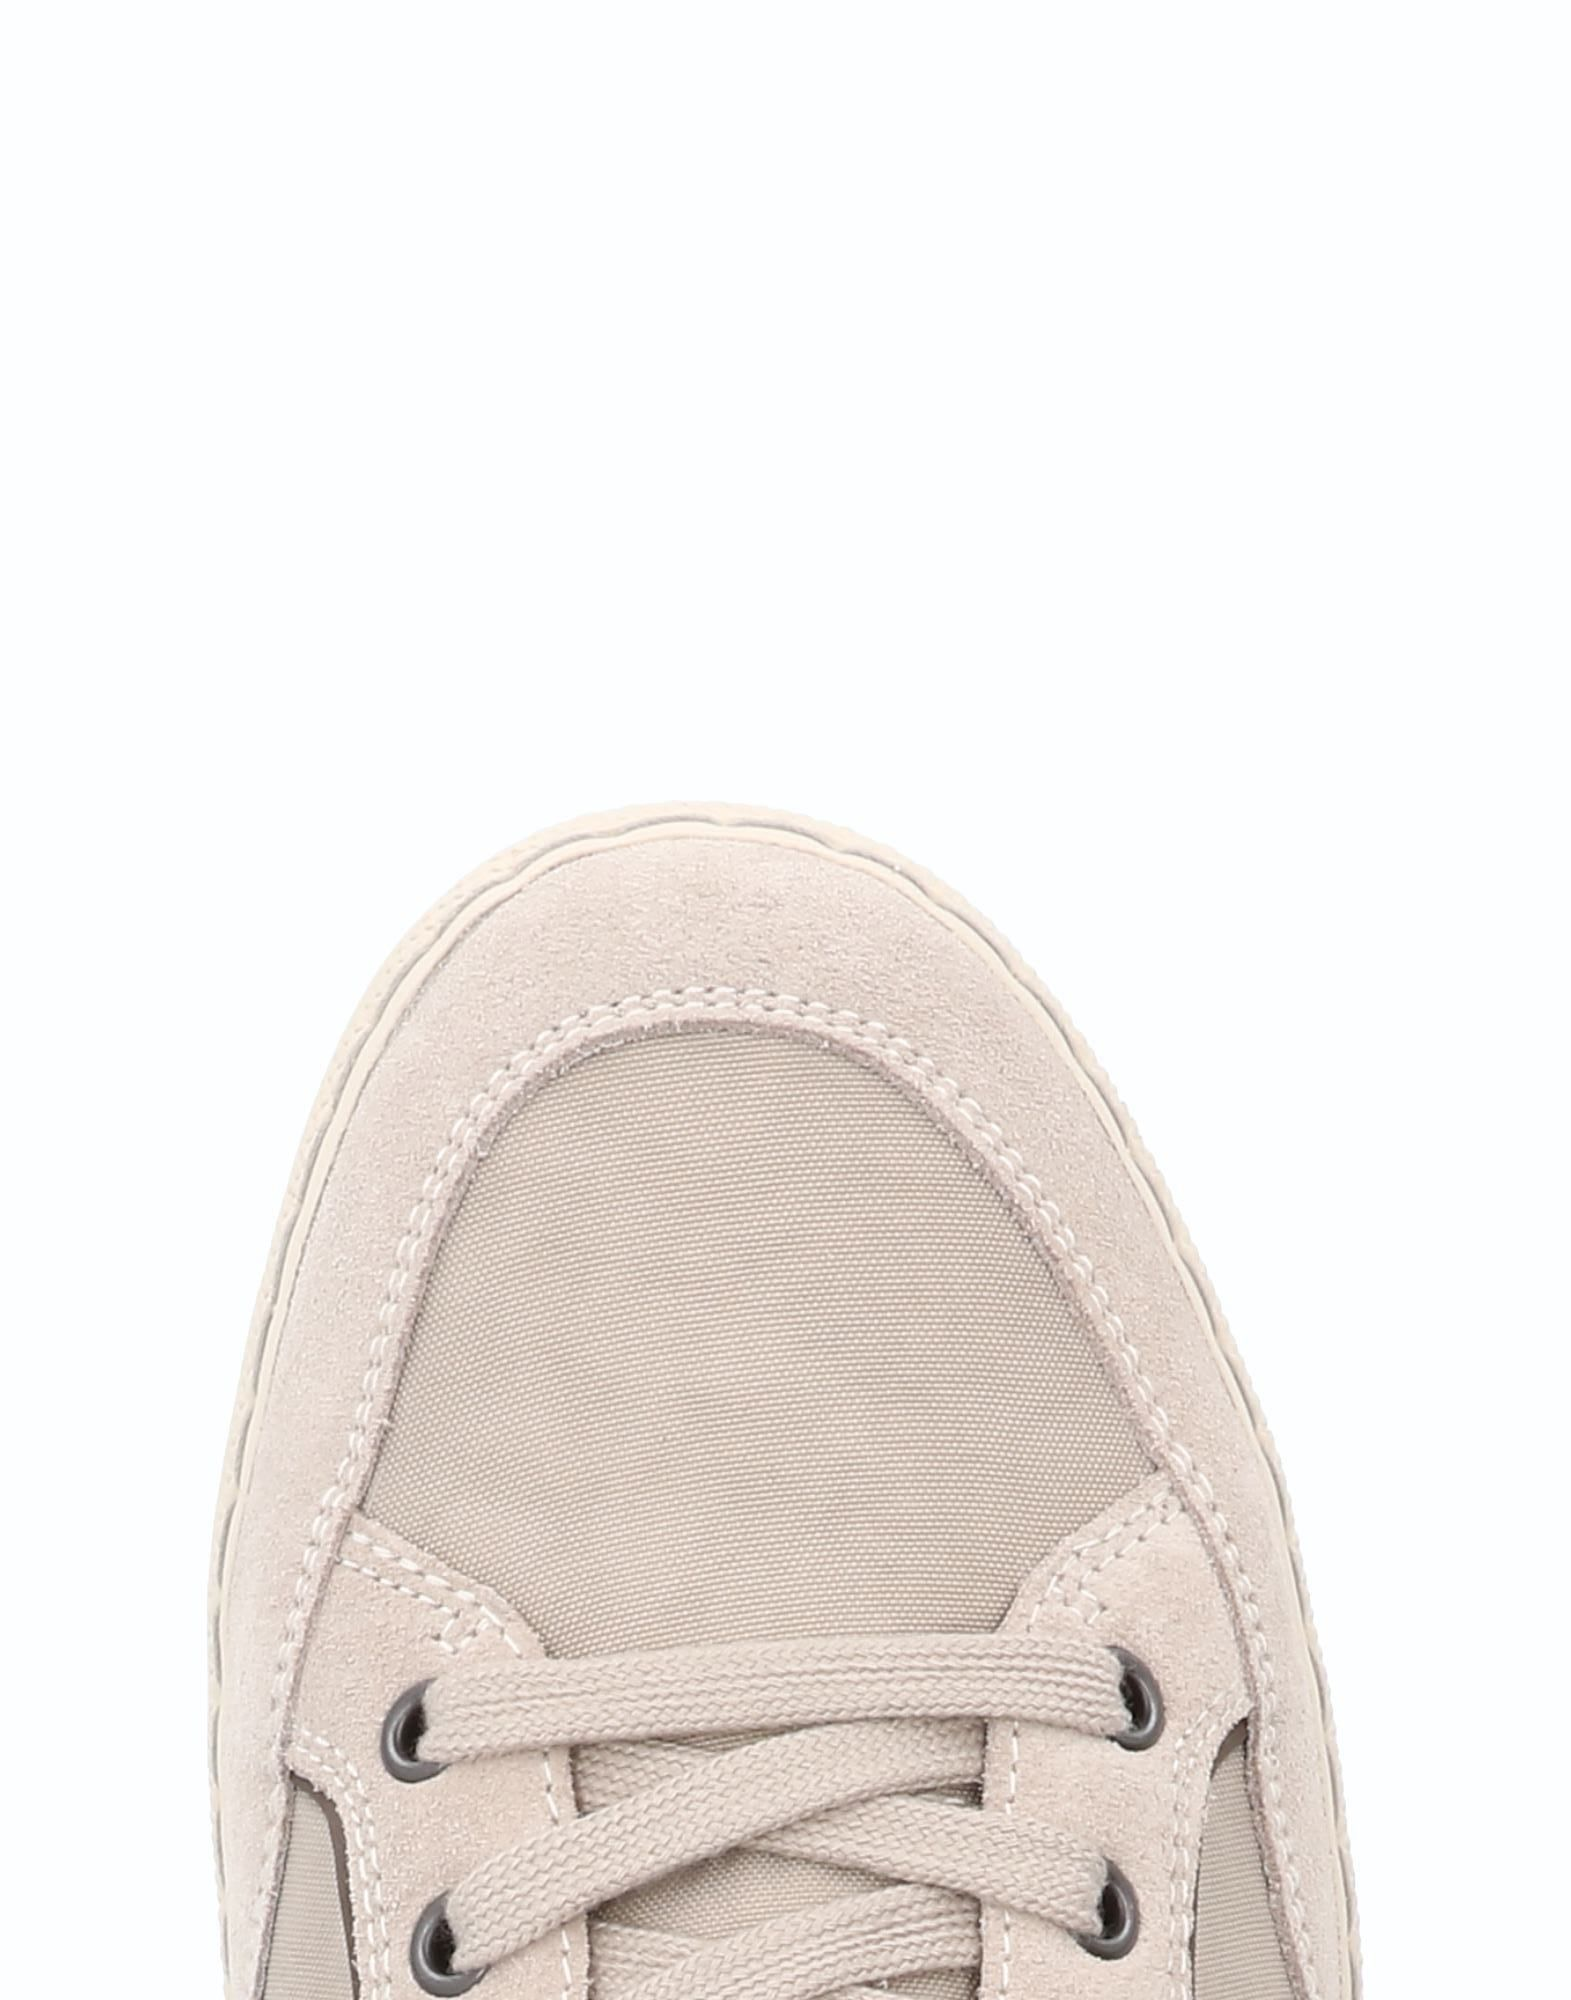 11198455ED Geox Sneakers Herren  11198455ED  Heiße Schuhe 9eca42